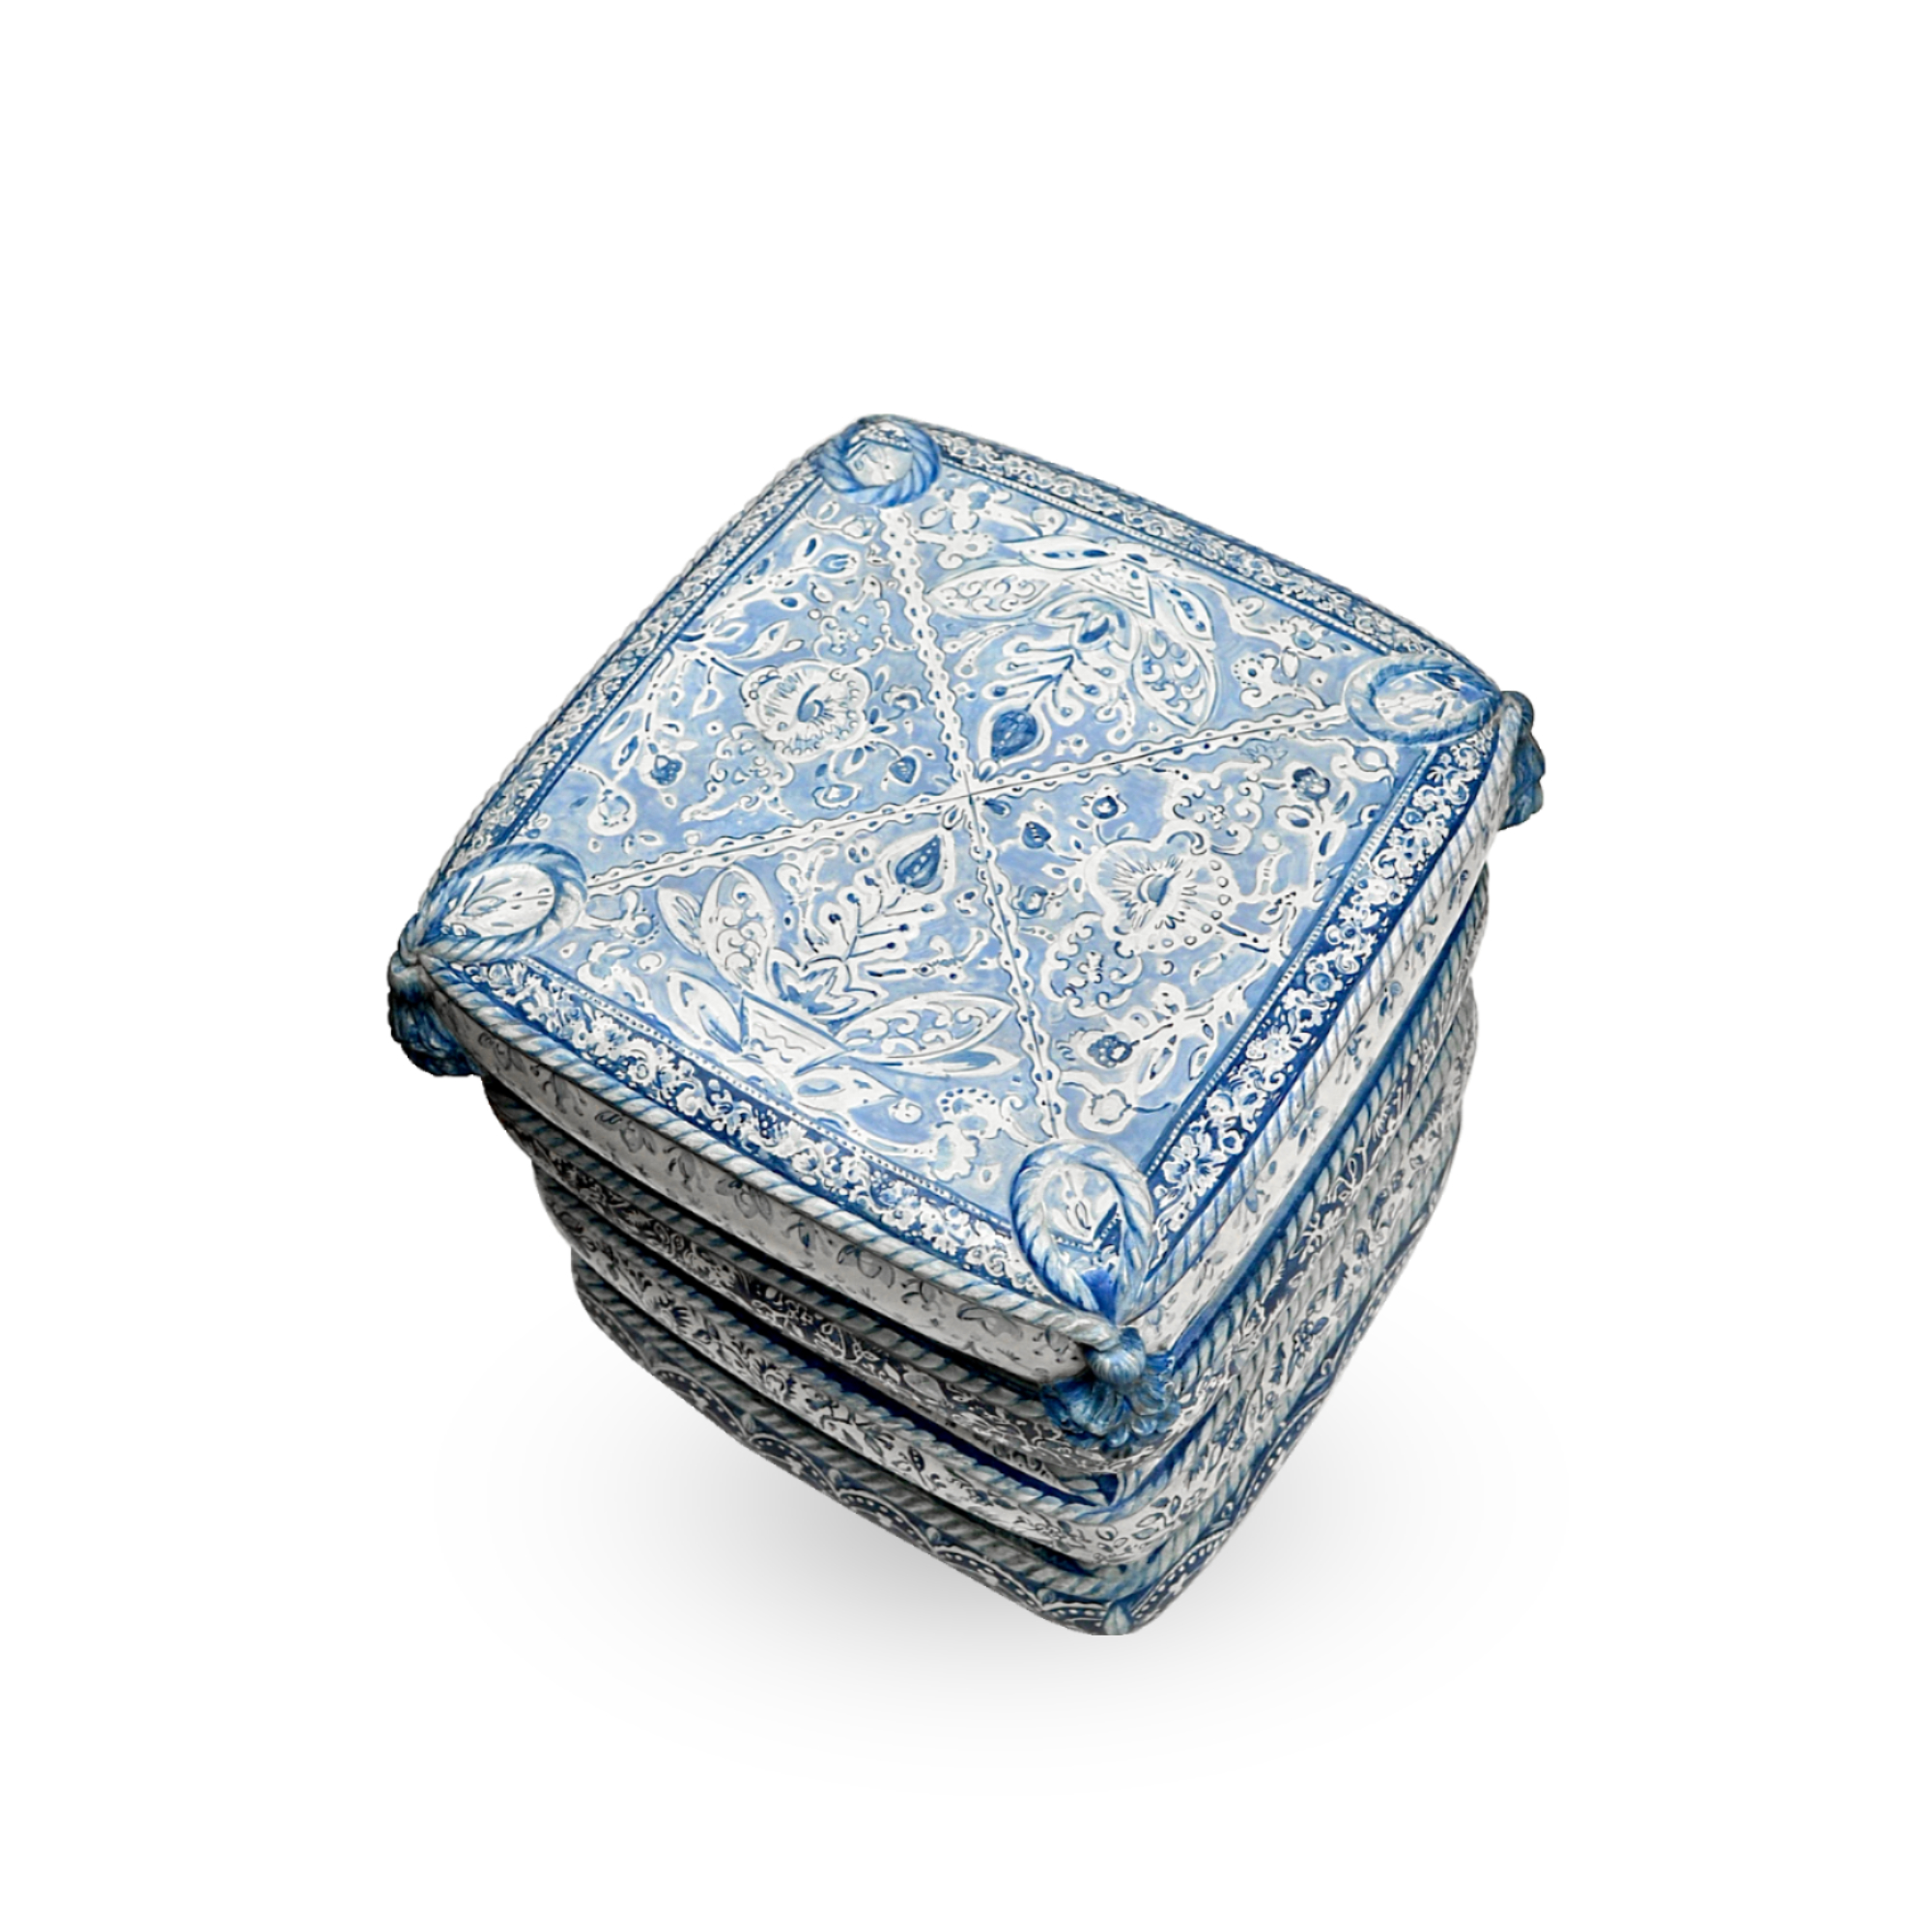 Hand-Painted-Cushion-Blue.jpg